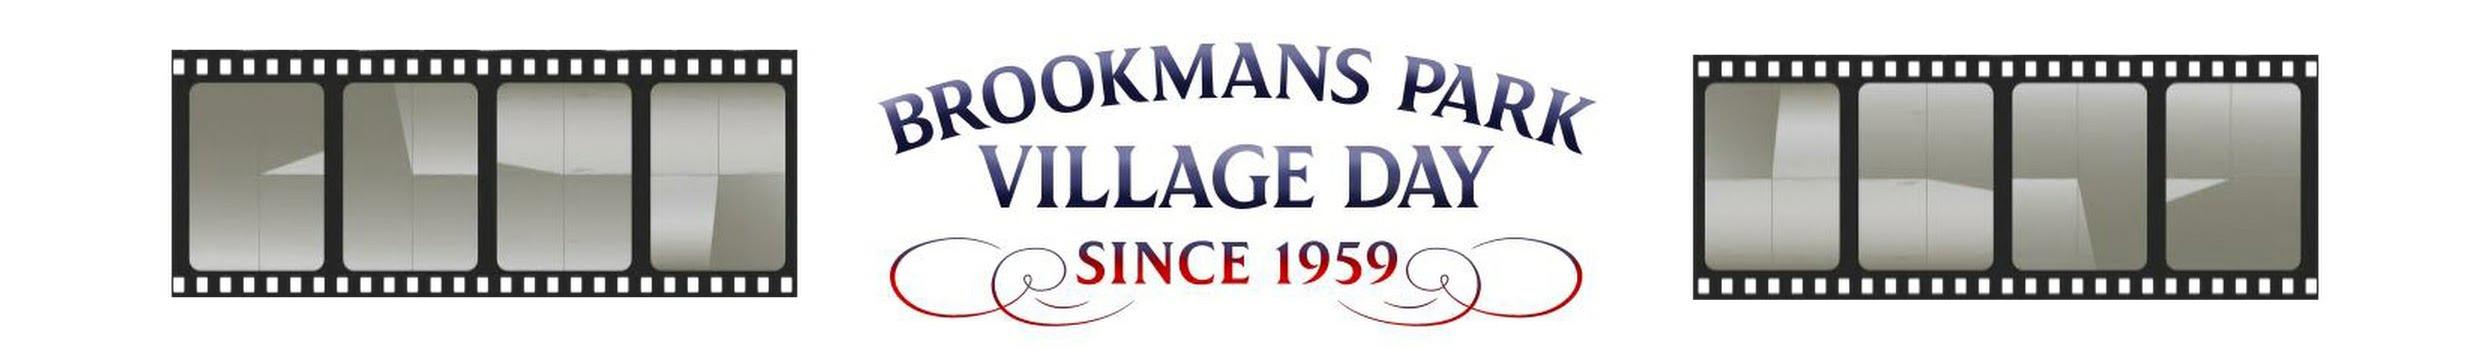 Brookmans Park Village Day